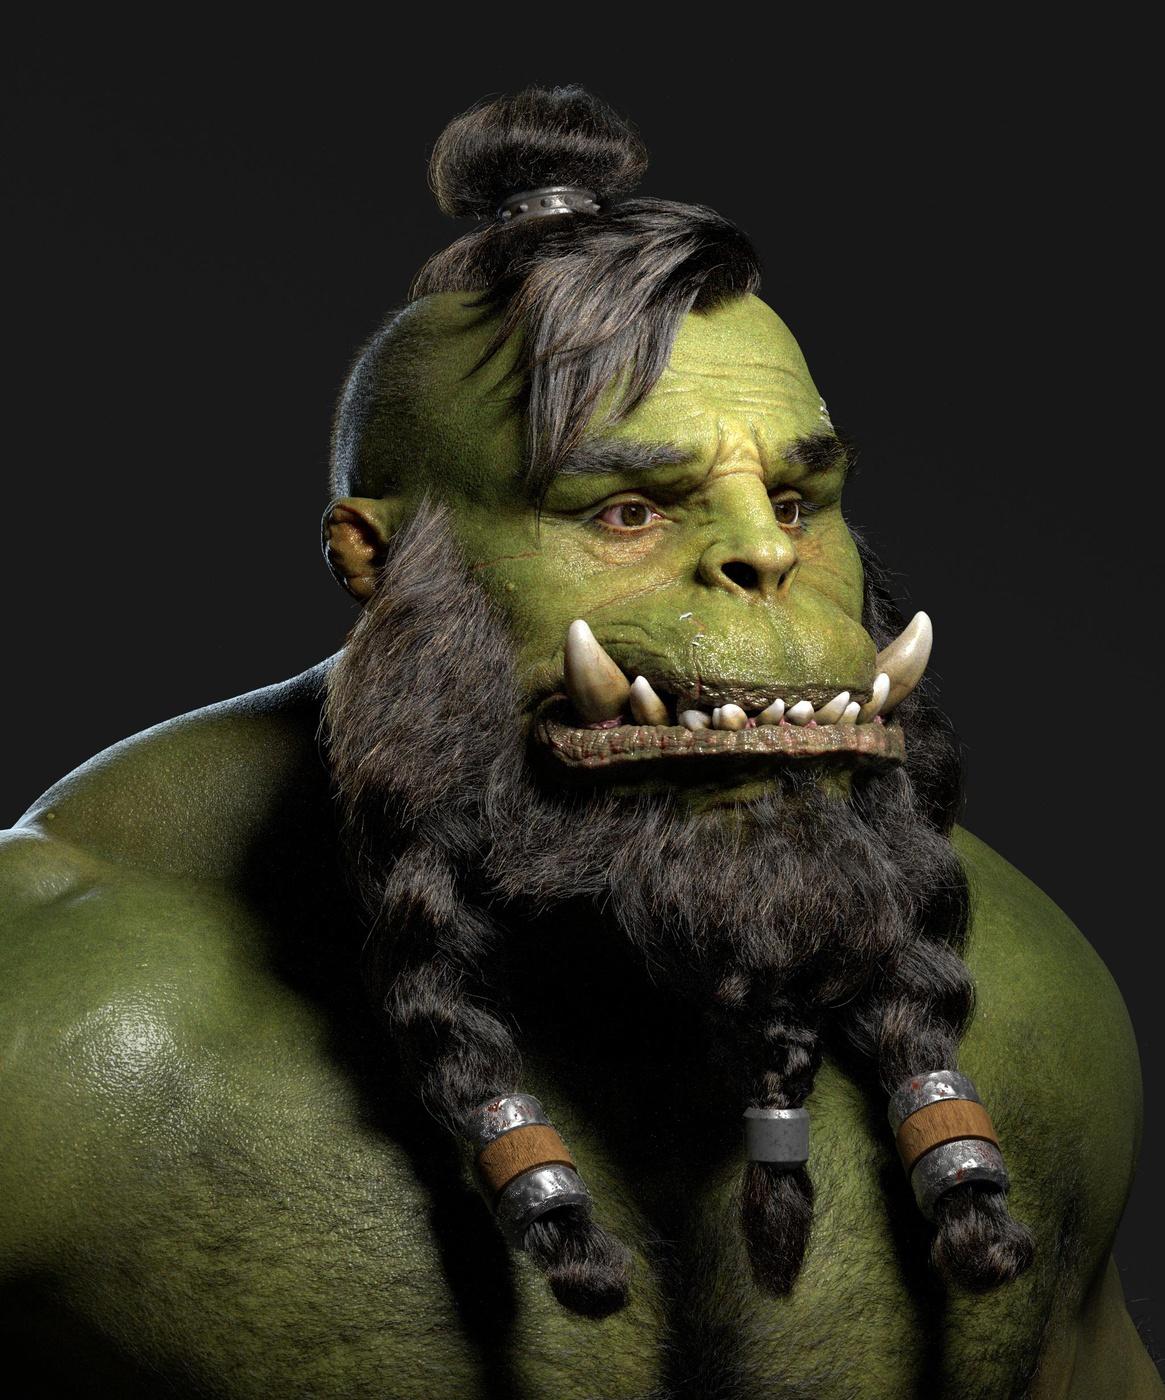 green orc character design fantasy 3d